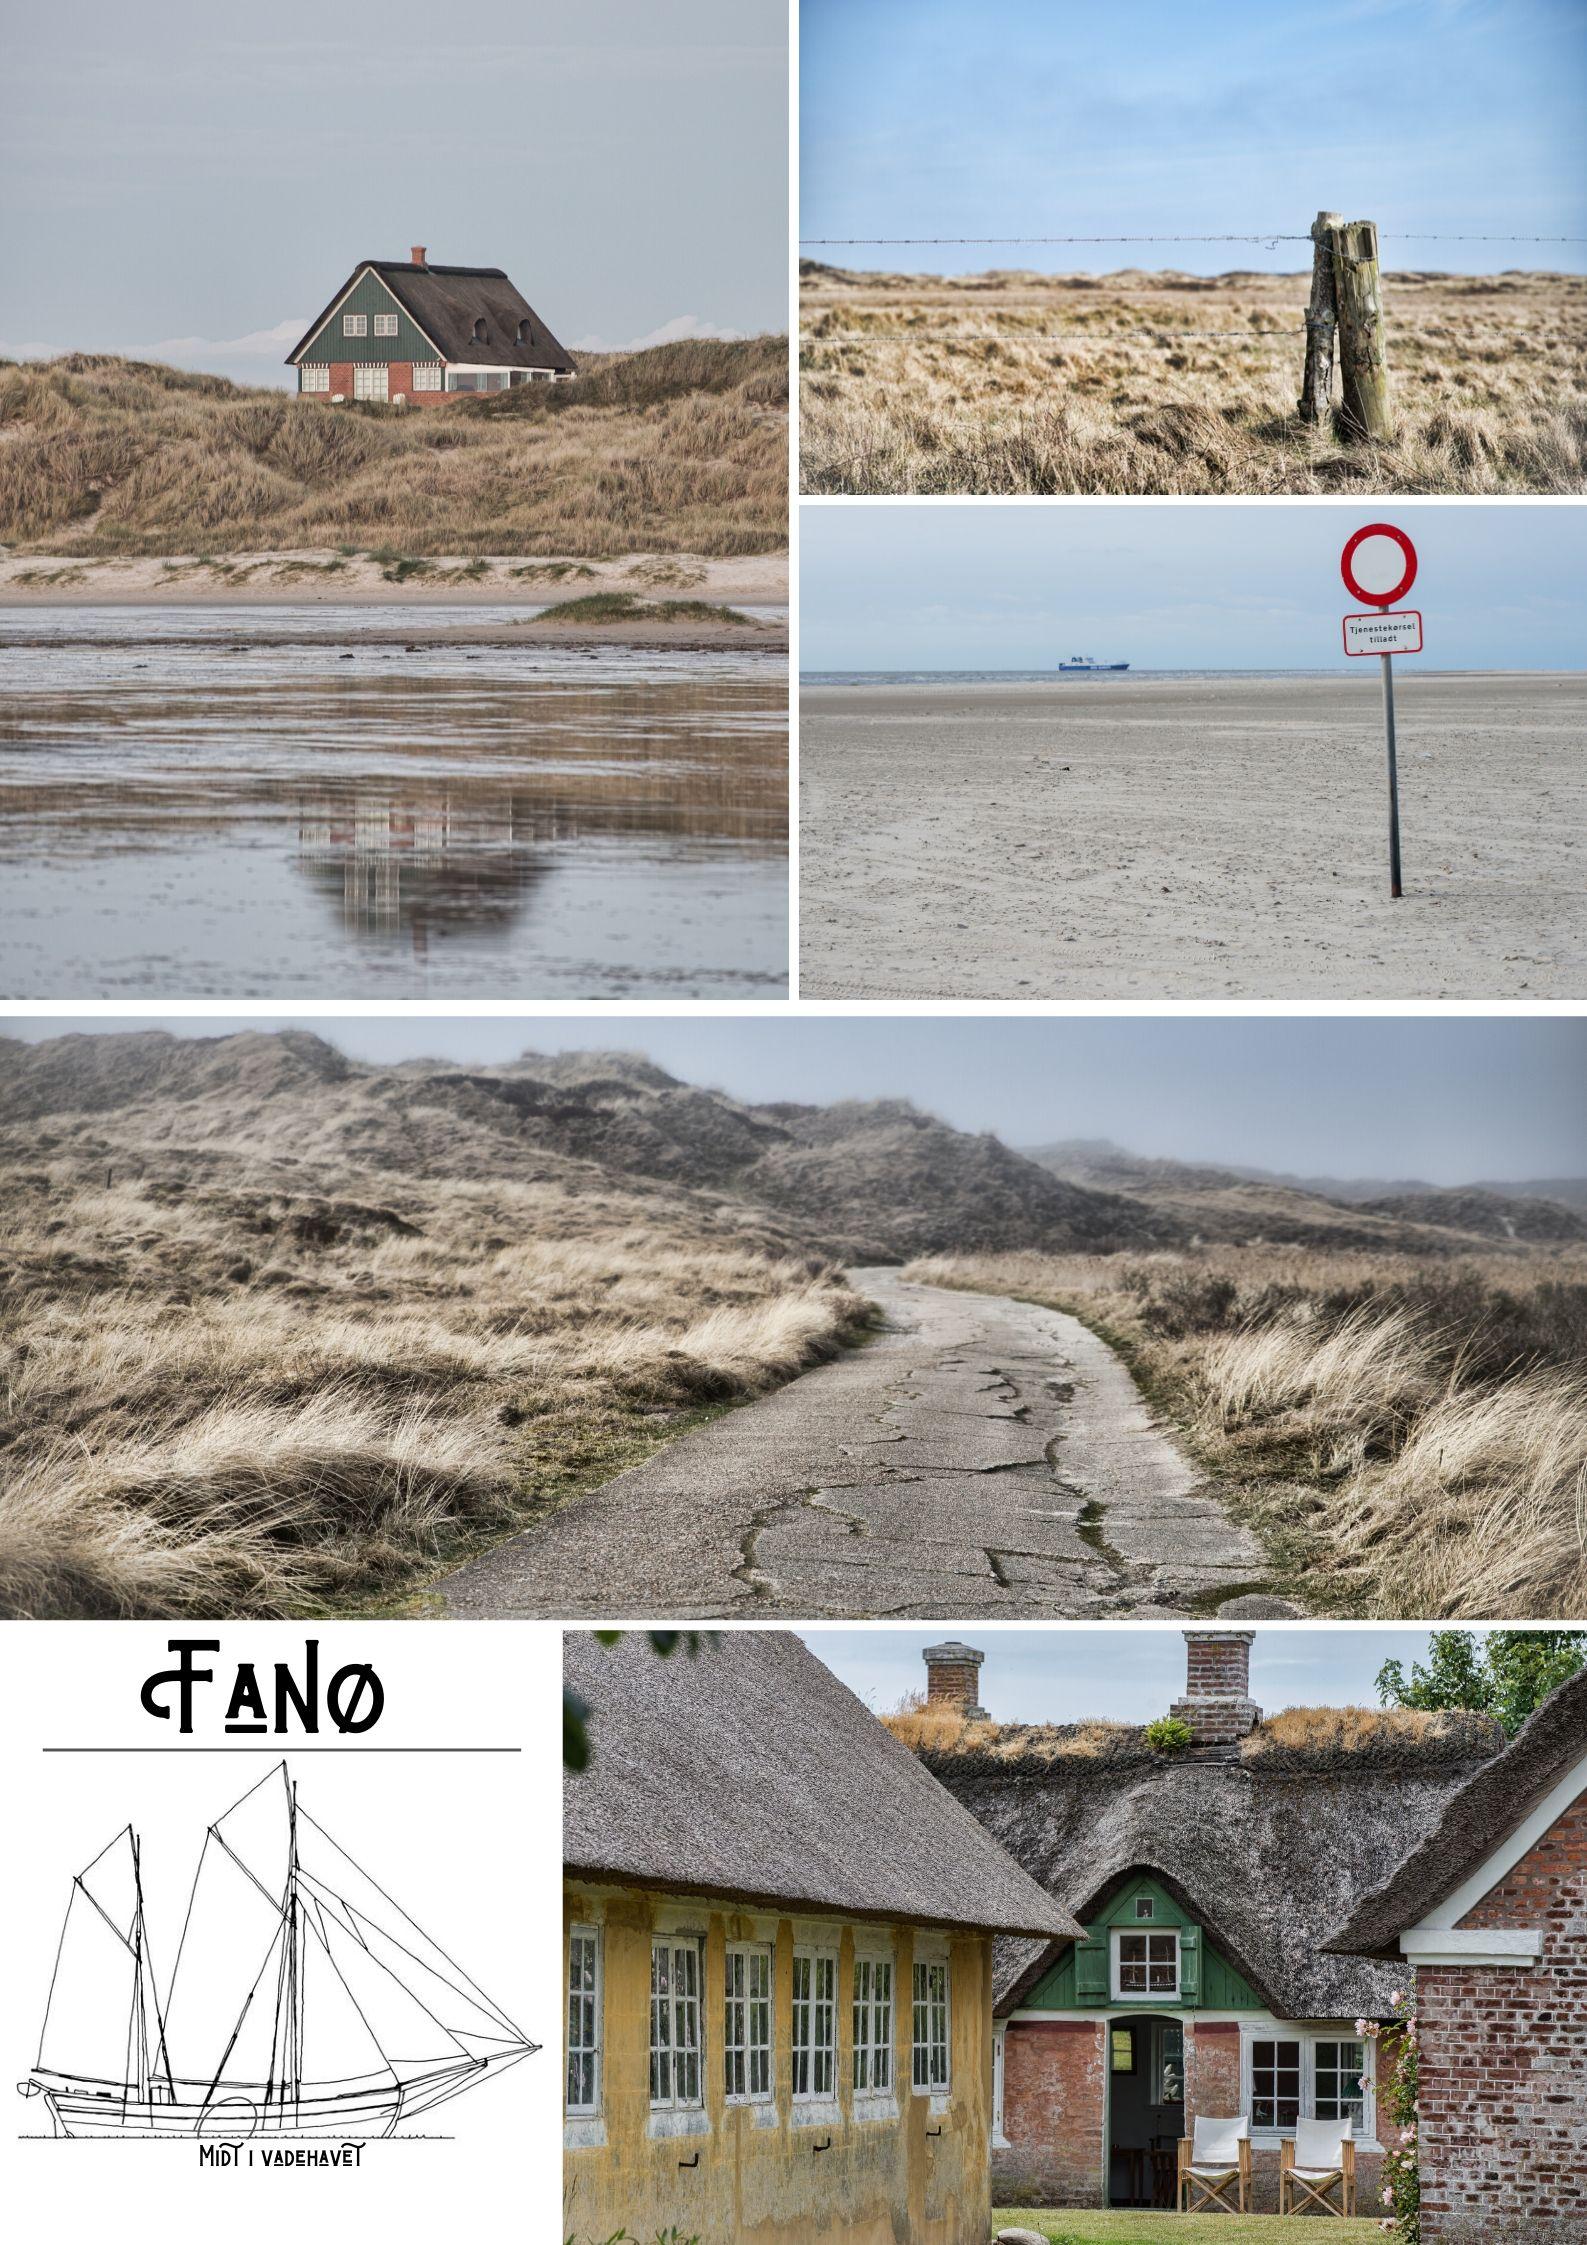 Fanø Plakat - Bare Fanø